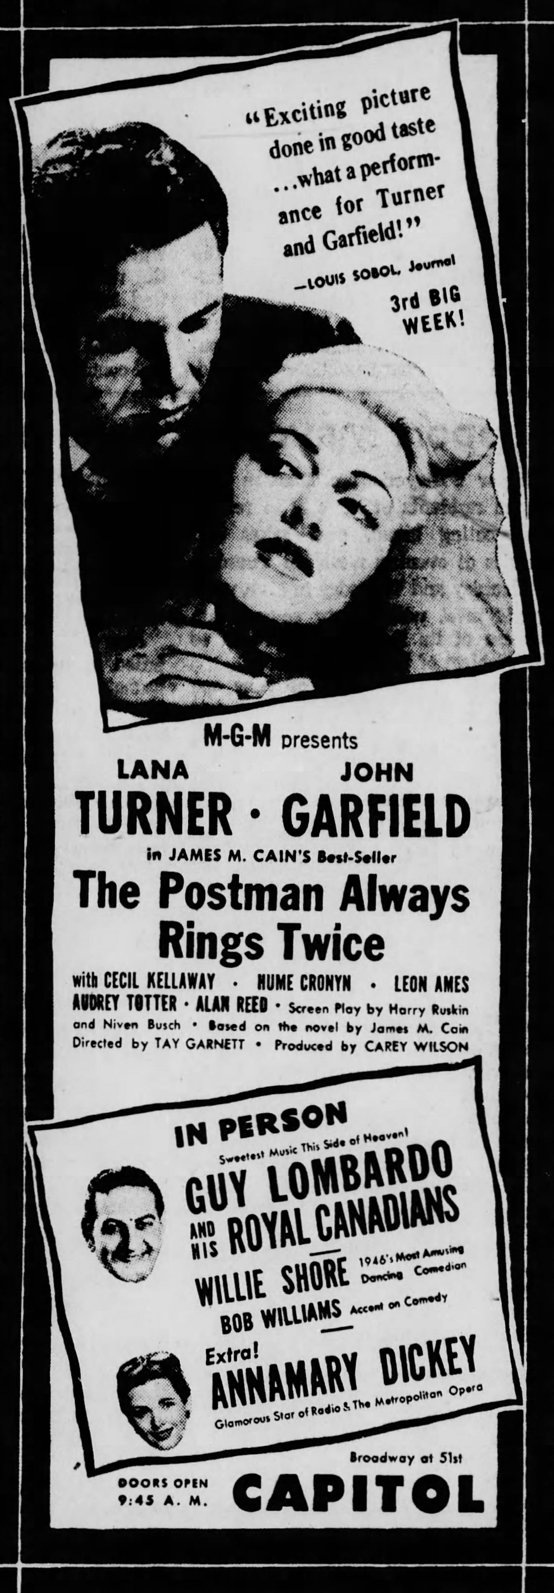 Source: Brooklyn Daily Eagle of Brooklyn, NY, May 15, 1946, page 11.